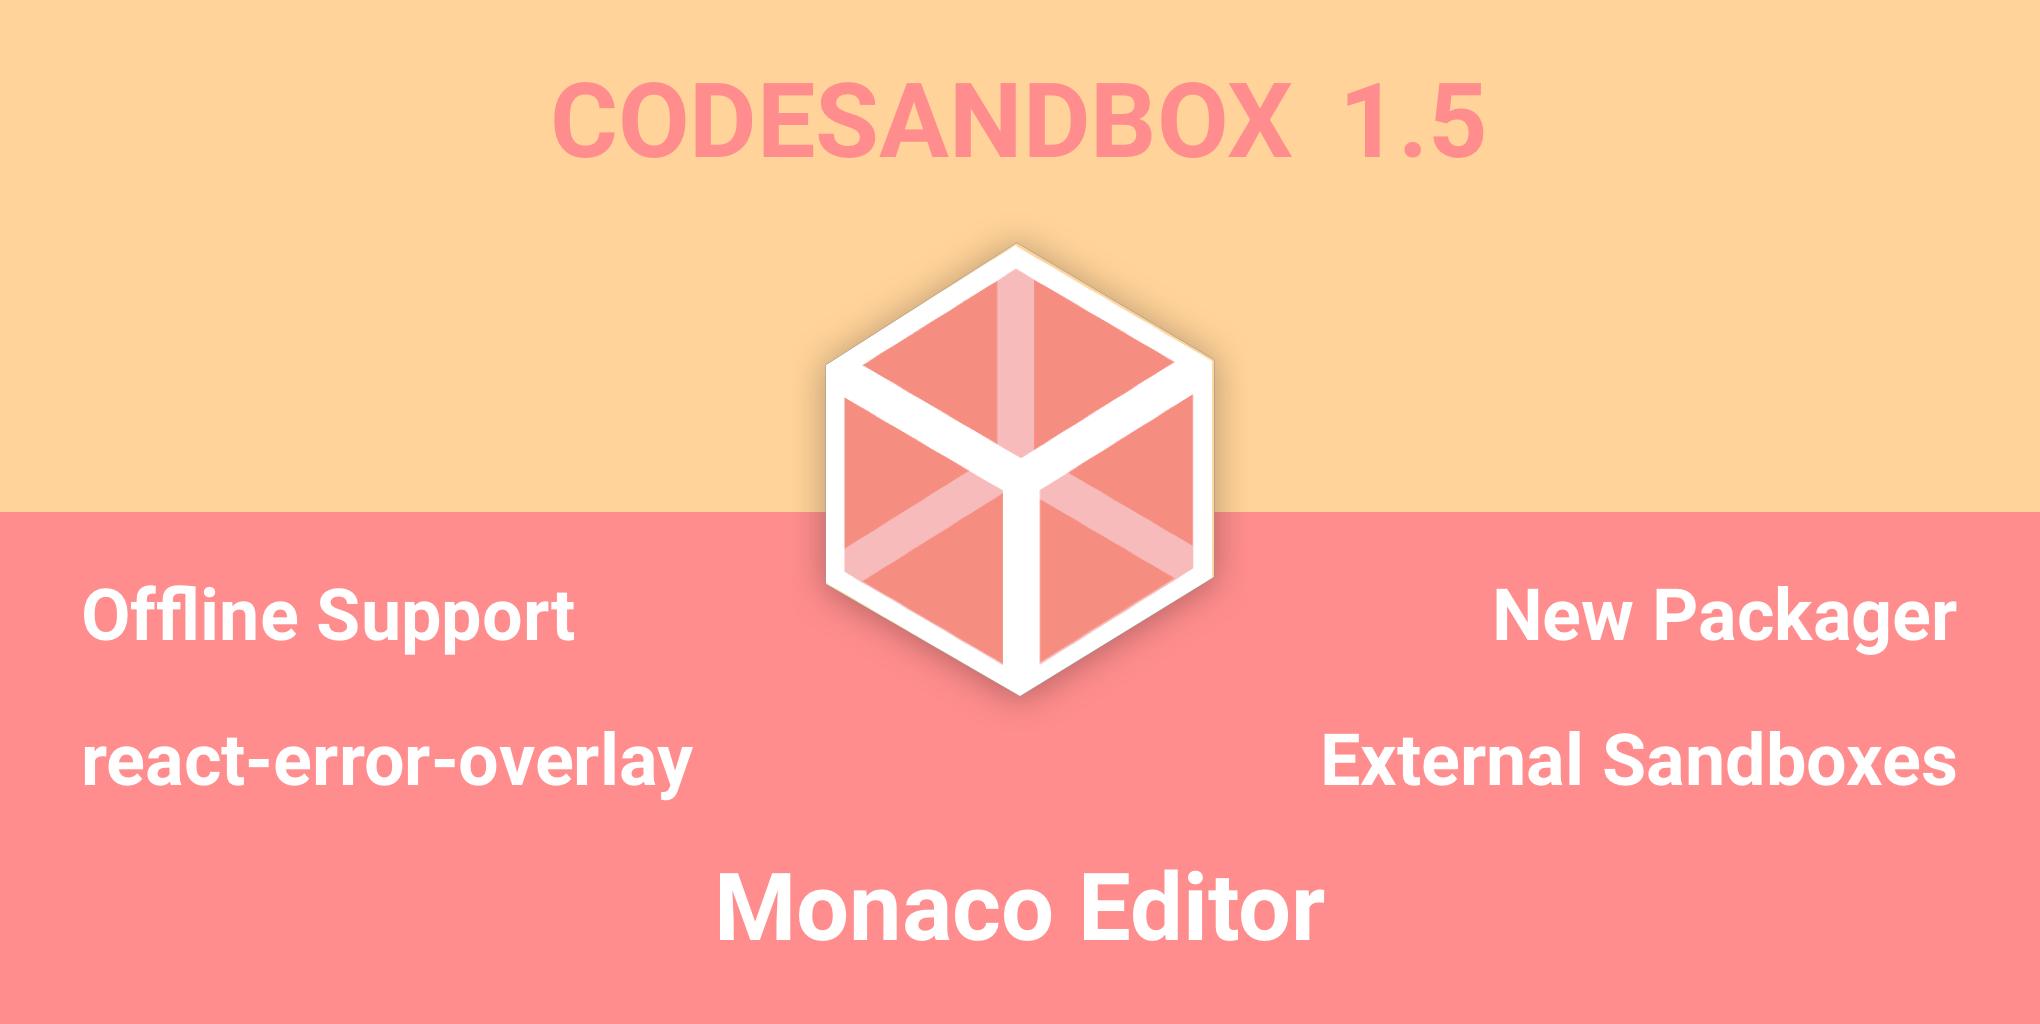 /codesandbox-1-5-changelog-bbf941c7f0dc feature image